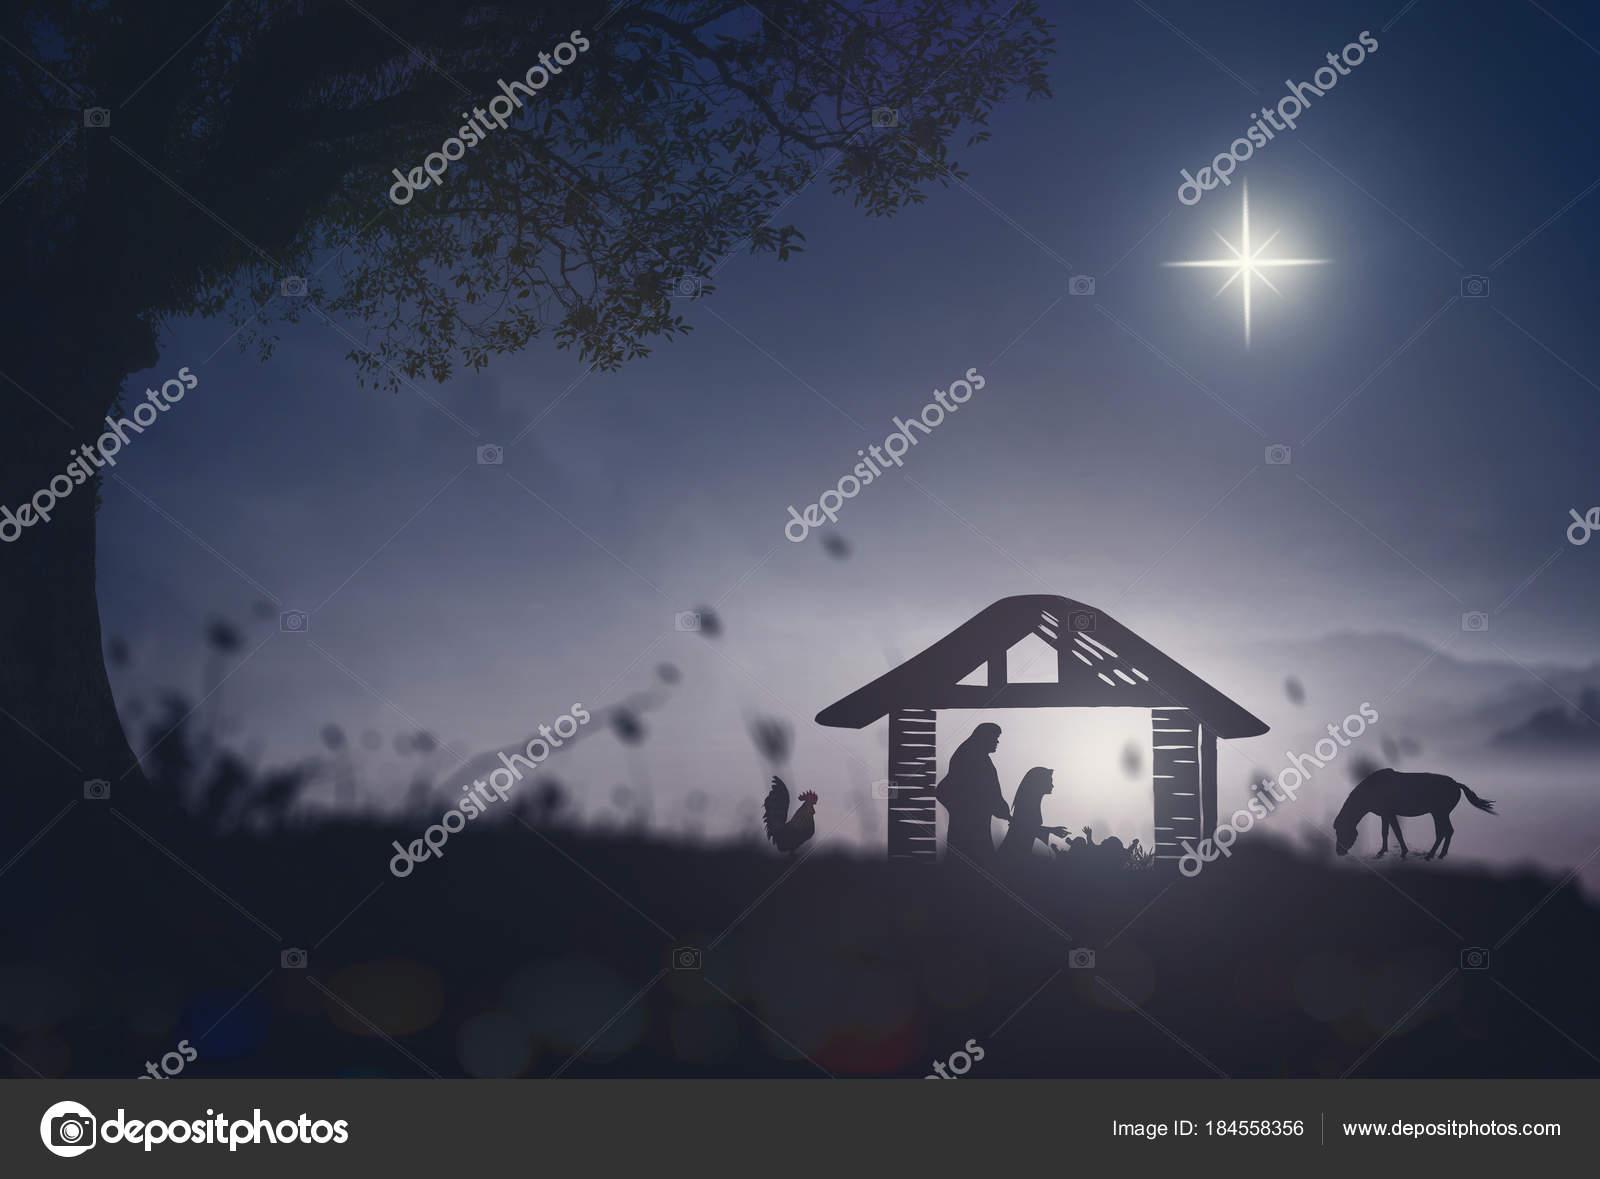 2dada183a65 Concepto de historia de Natividad  silueta madre Mary